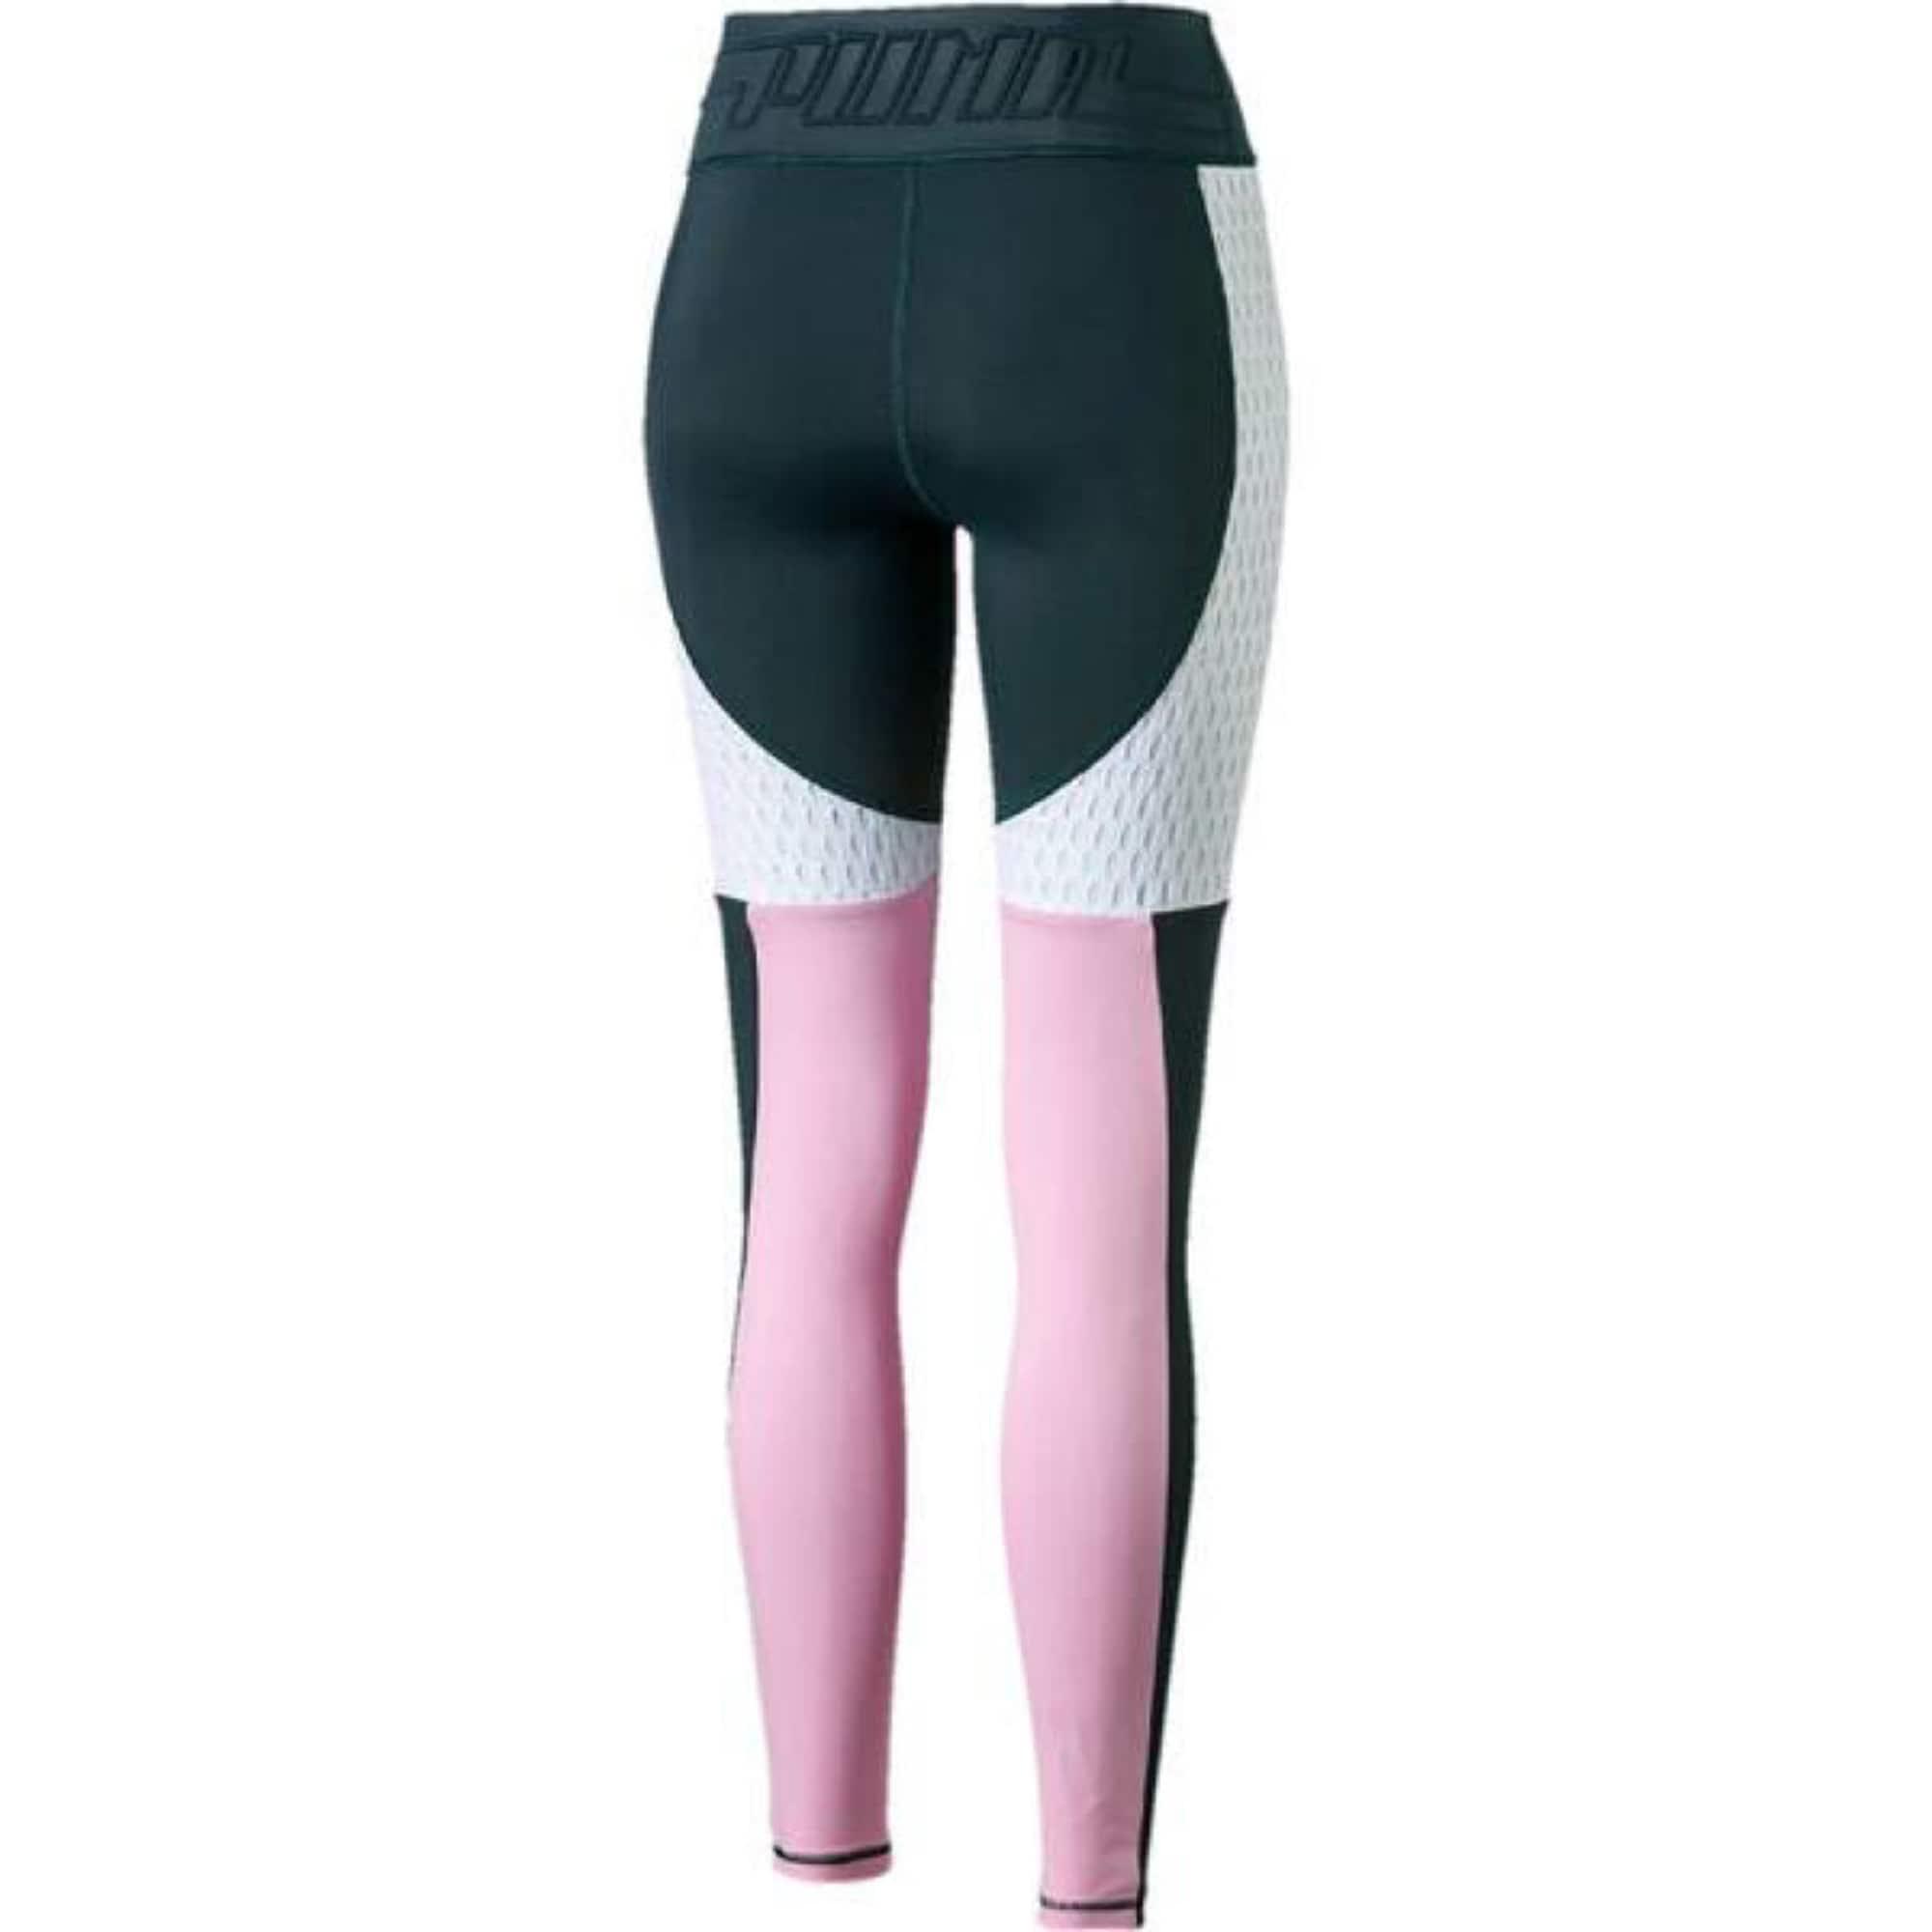 Sport-Leggings 'Cosmic' | Sportbekleidung > Sporthosen > Sportleggings | Puma